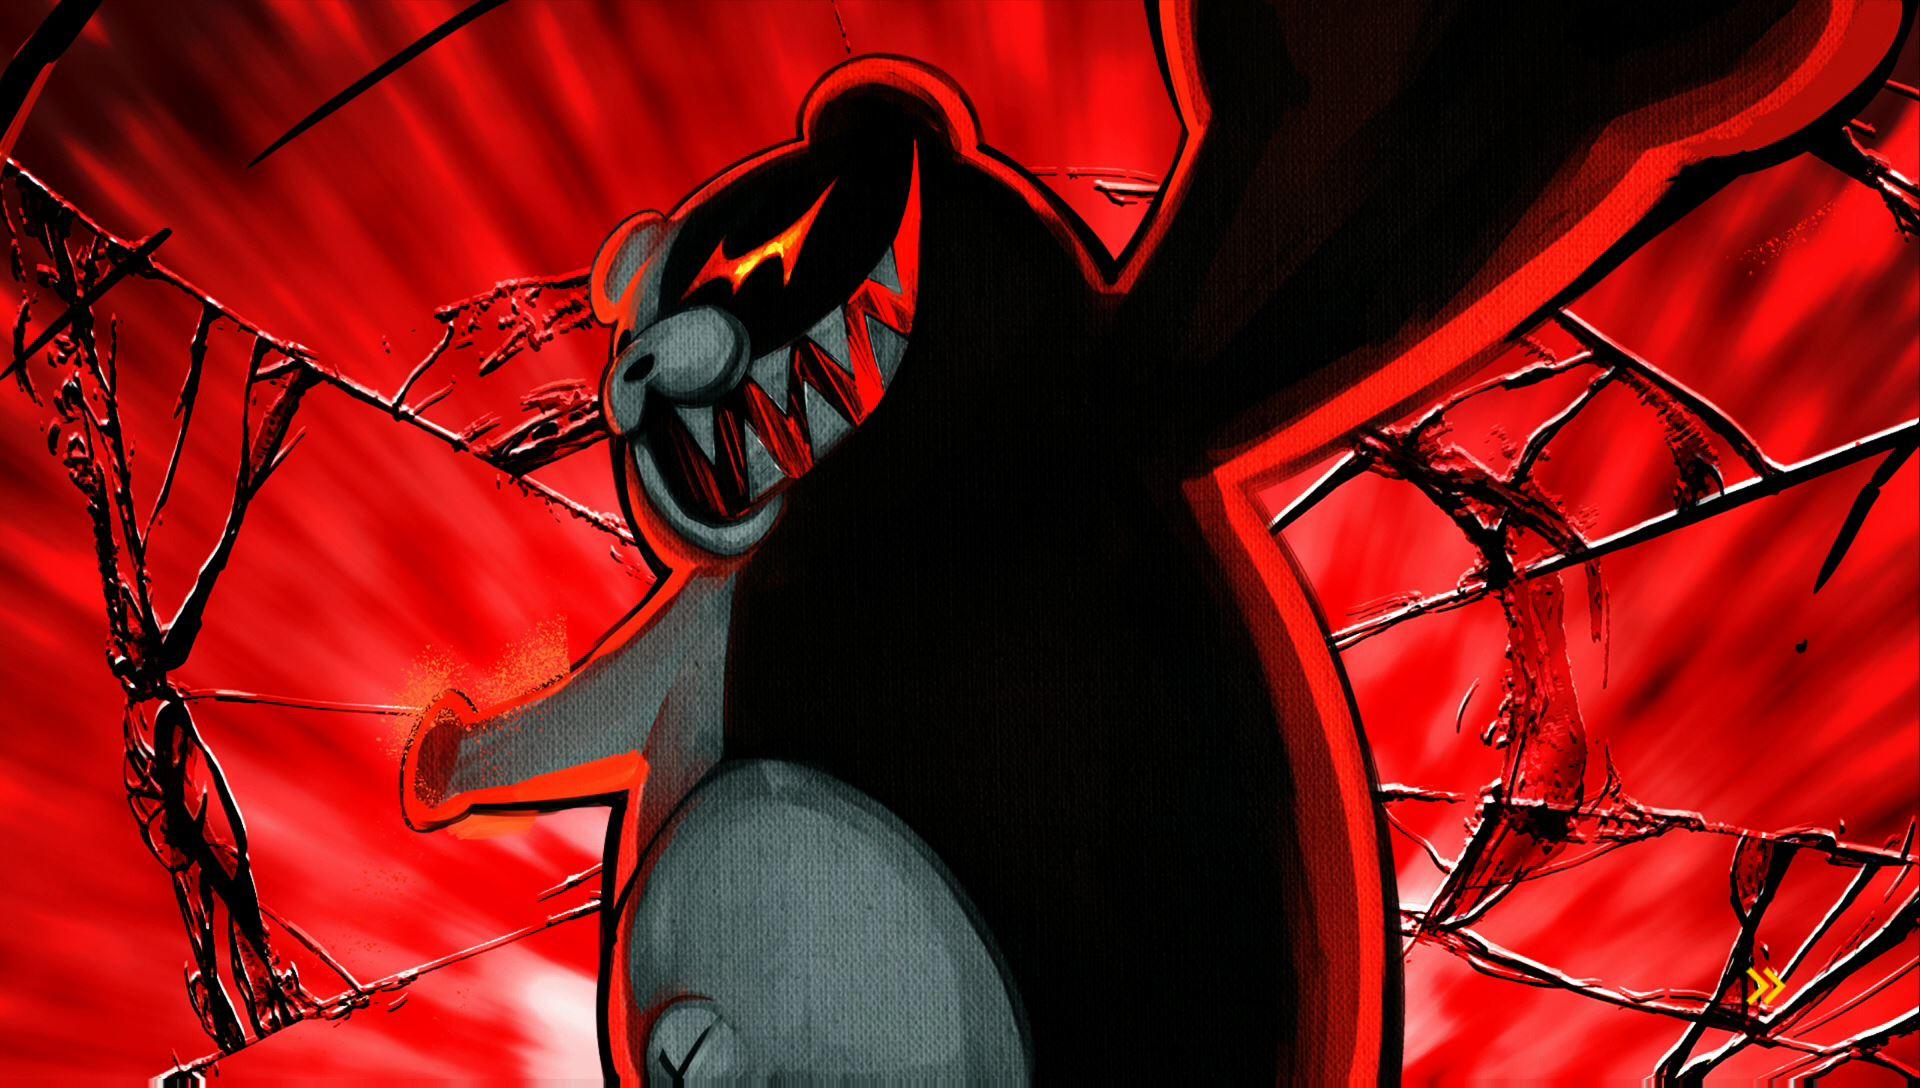 2177570 additionally Review Back Murder School Danganronpa V3 moreover Watch besides File Art Book Scan Danganronpa V3 Character Designs Betas Maki Harukawa  5 as well Review Danganronpa V3. on danganronpa v3 killing harmony maki